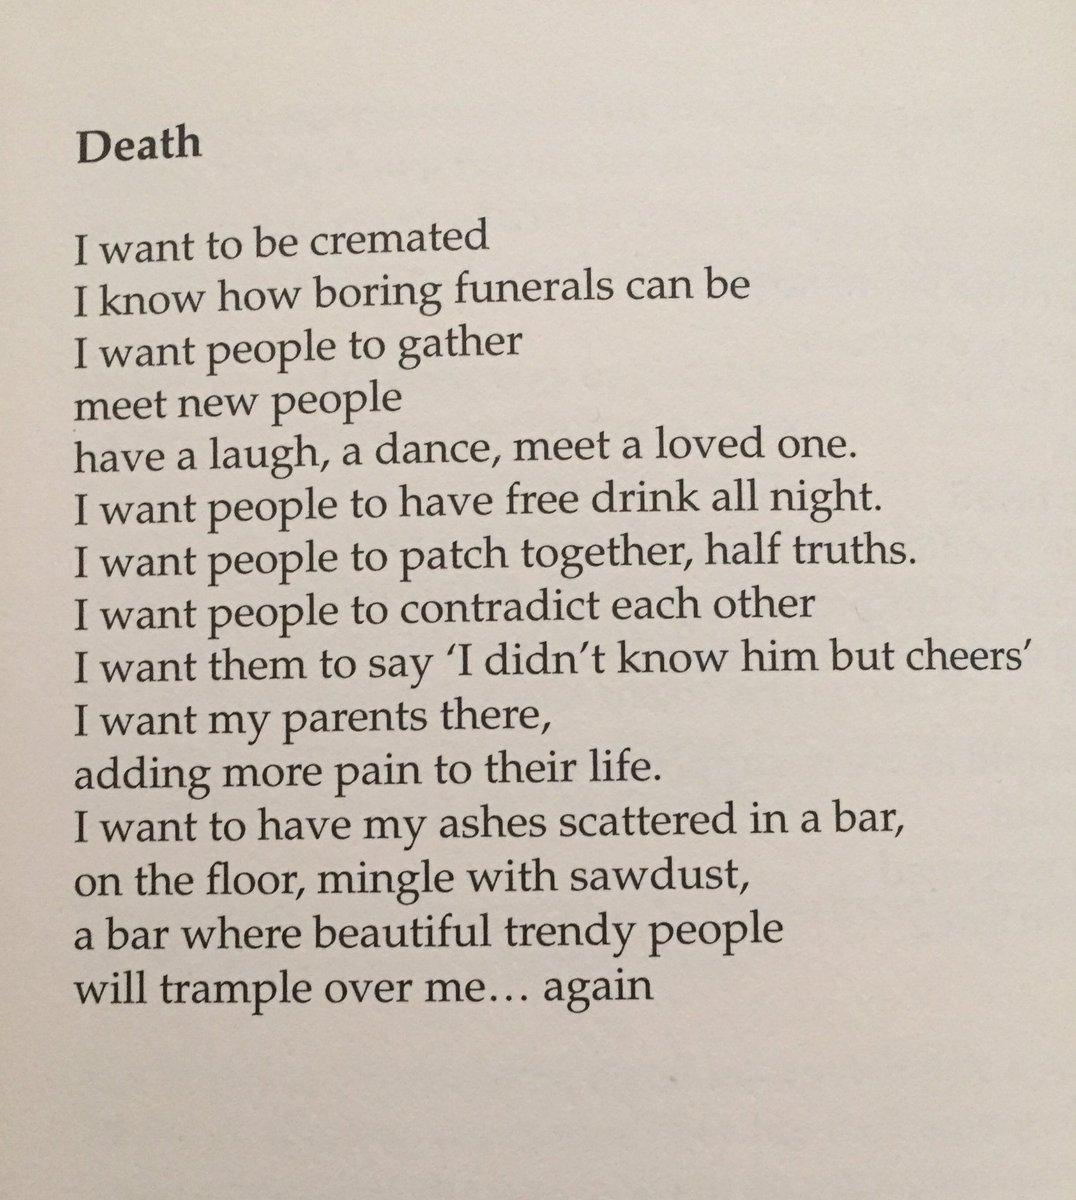 RT @Vivienneclore: A poem by #seanhughes #RIPSeanHughes https://t.co/3WbyOr6BtM